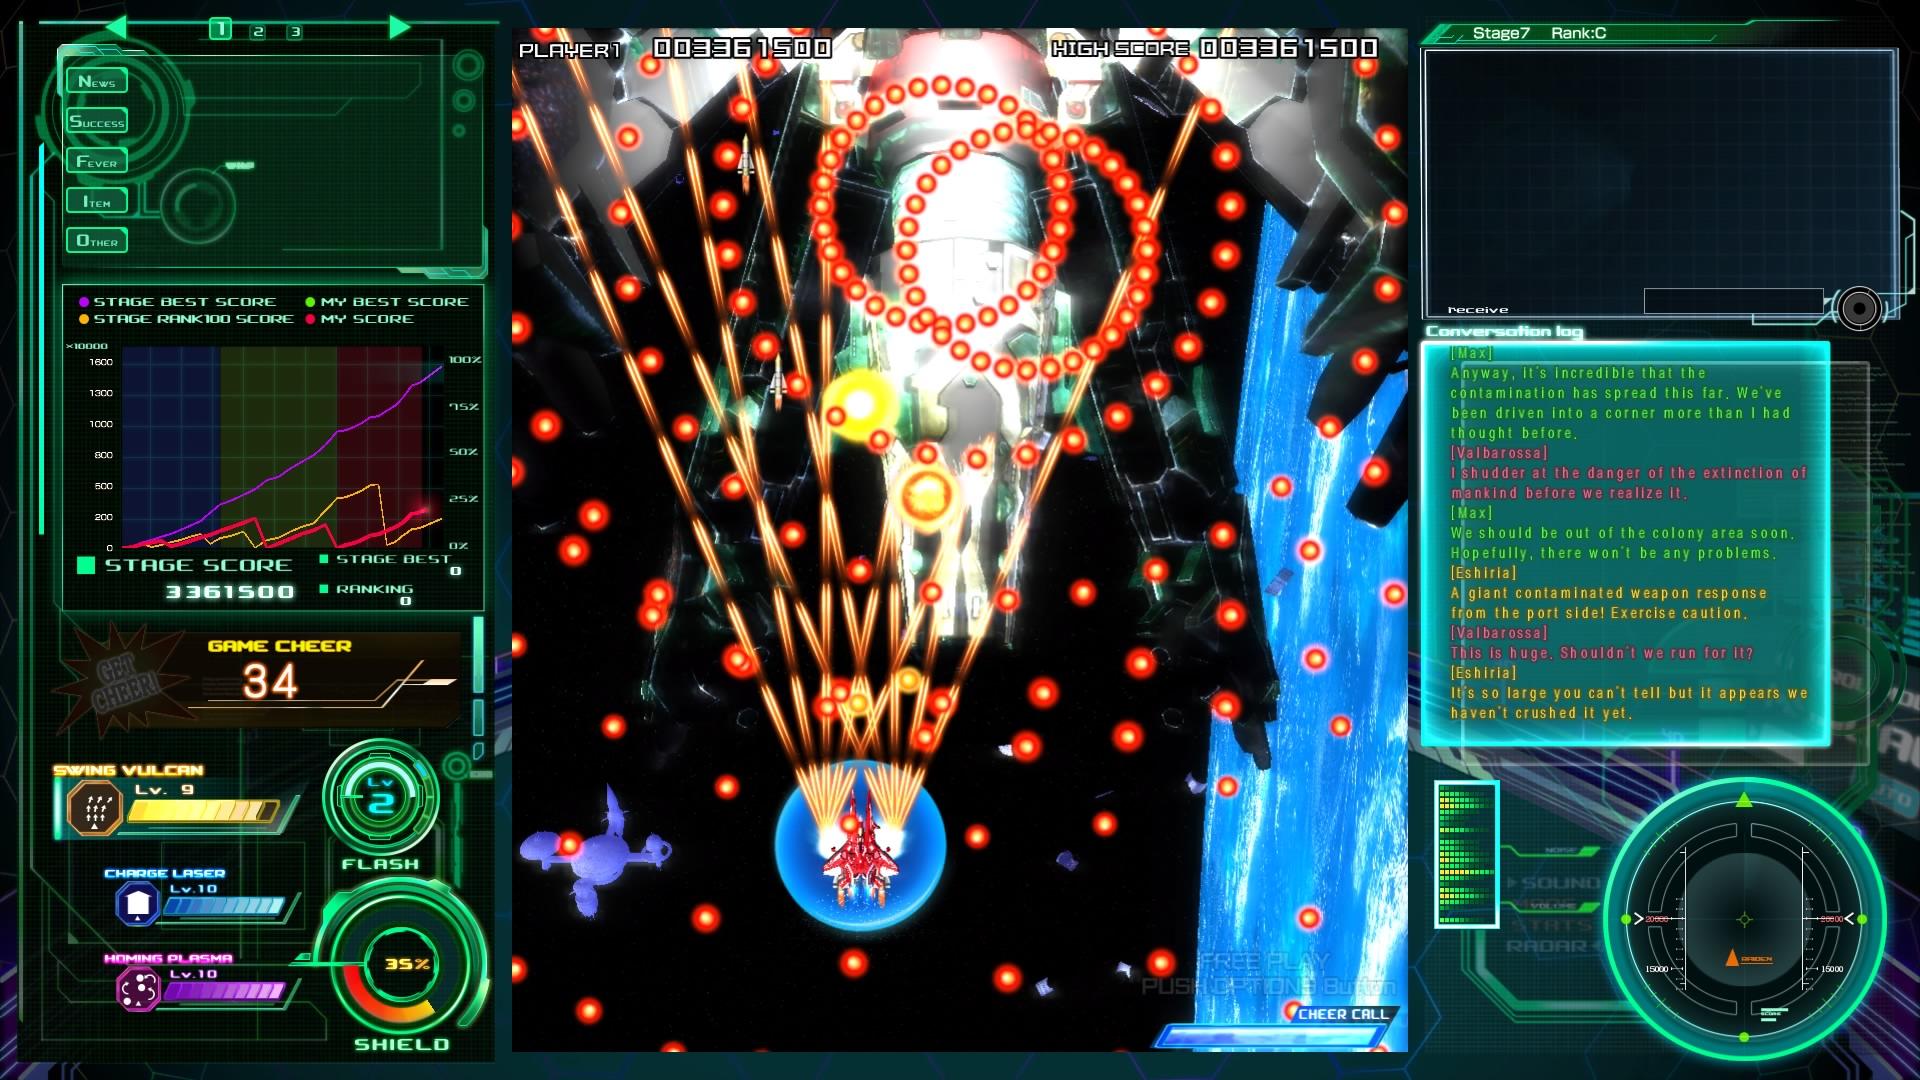 RaidenV_PS4_review.JPG